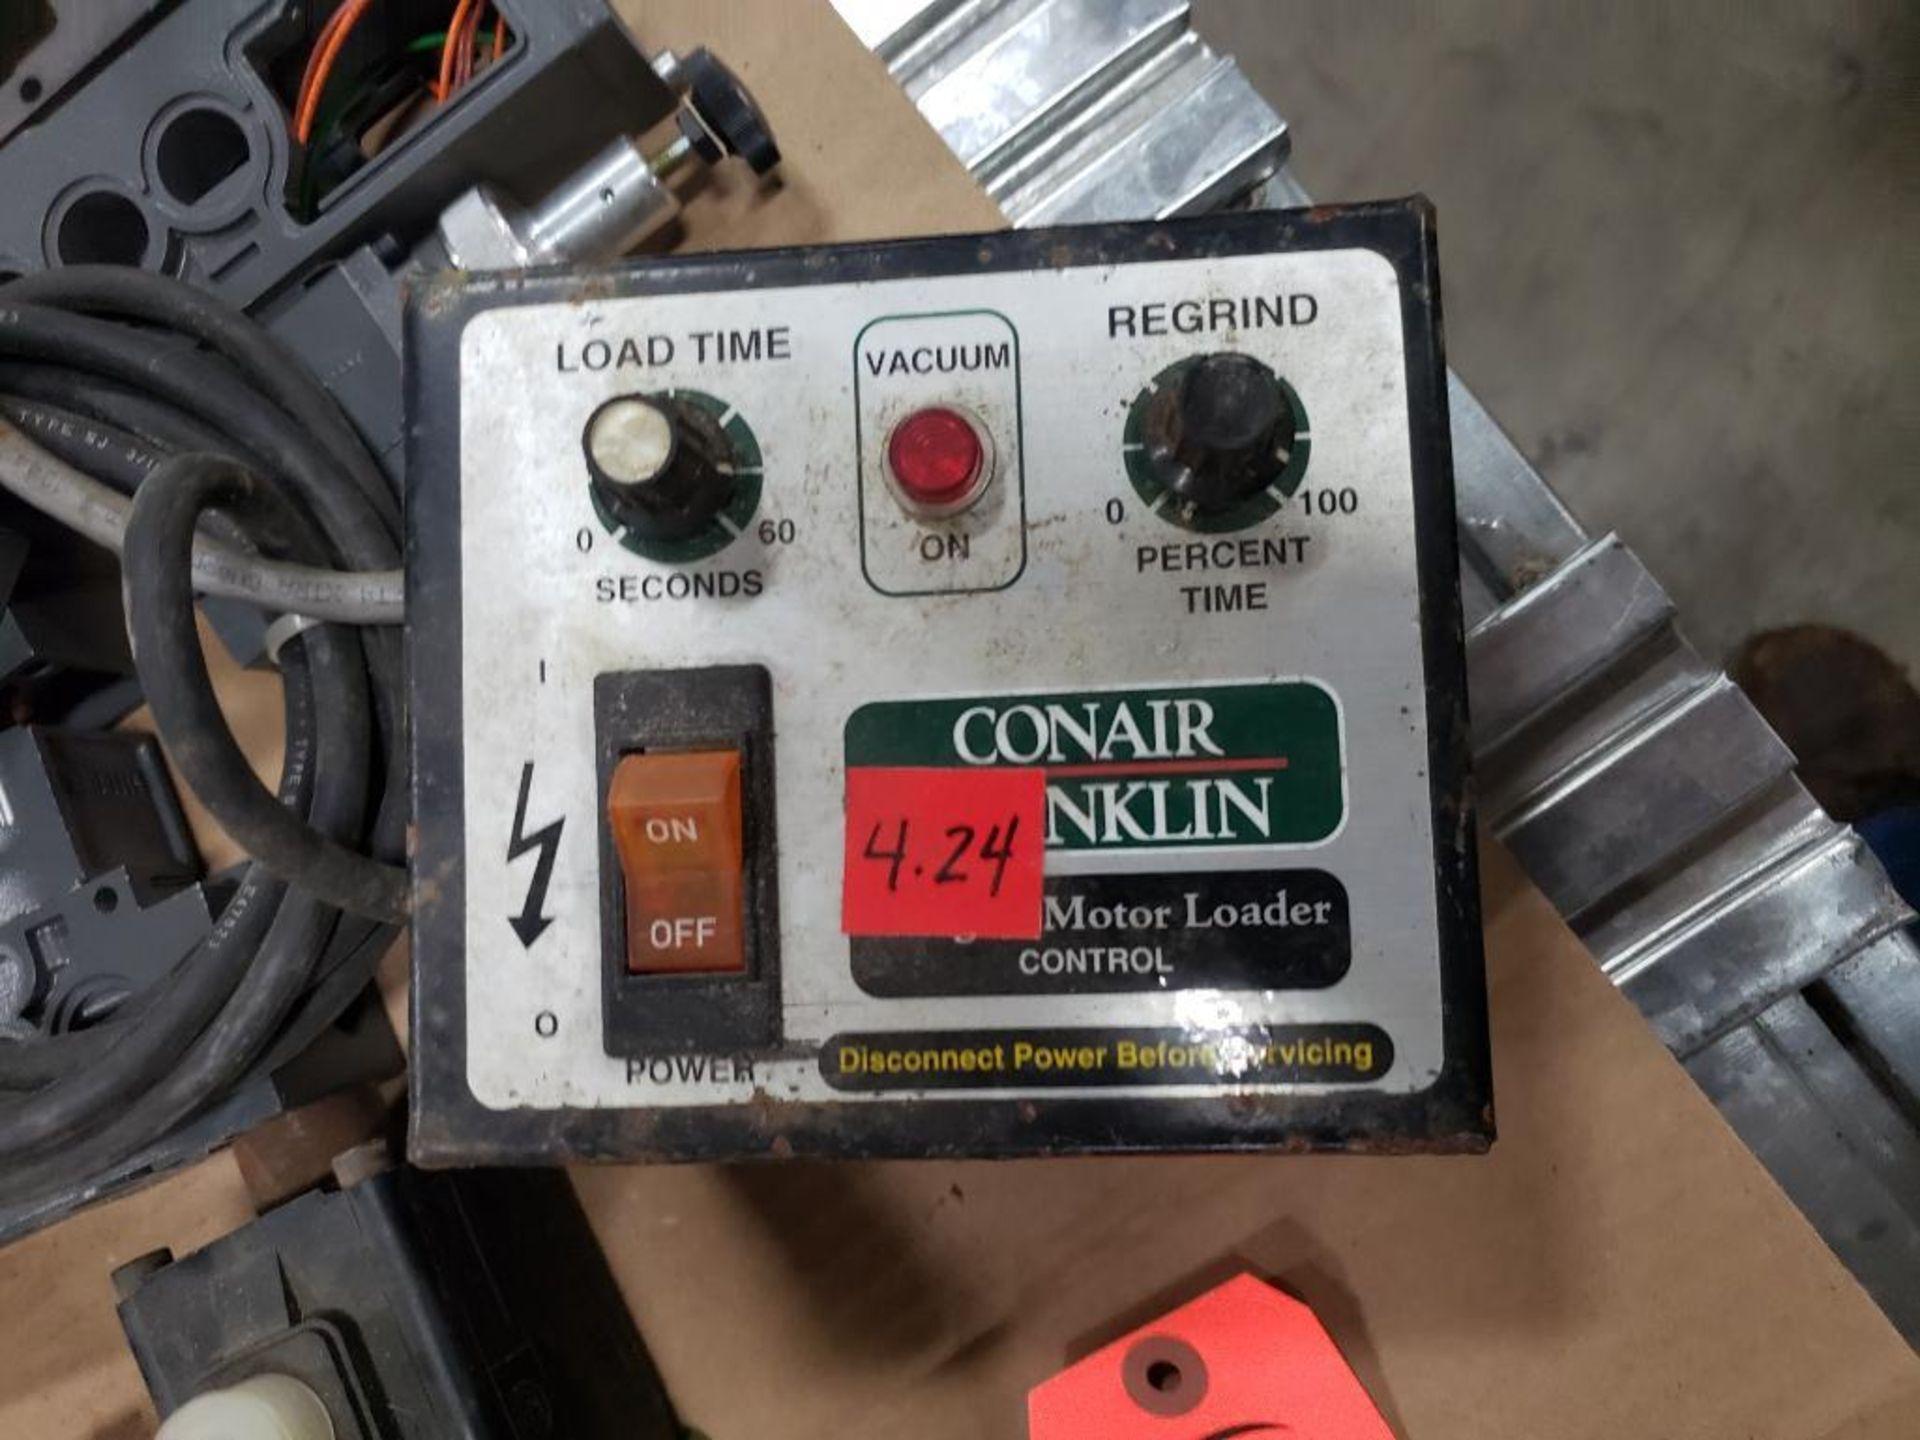 Pallet of assorted parts. Emergency eyewash, Conair universal terminal box, Hydraulik Ring valve. - Image 4 of 14